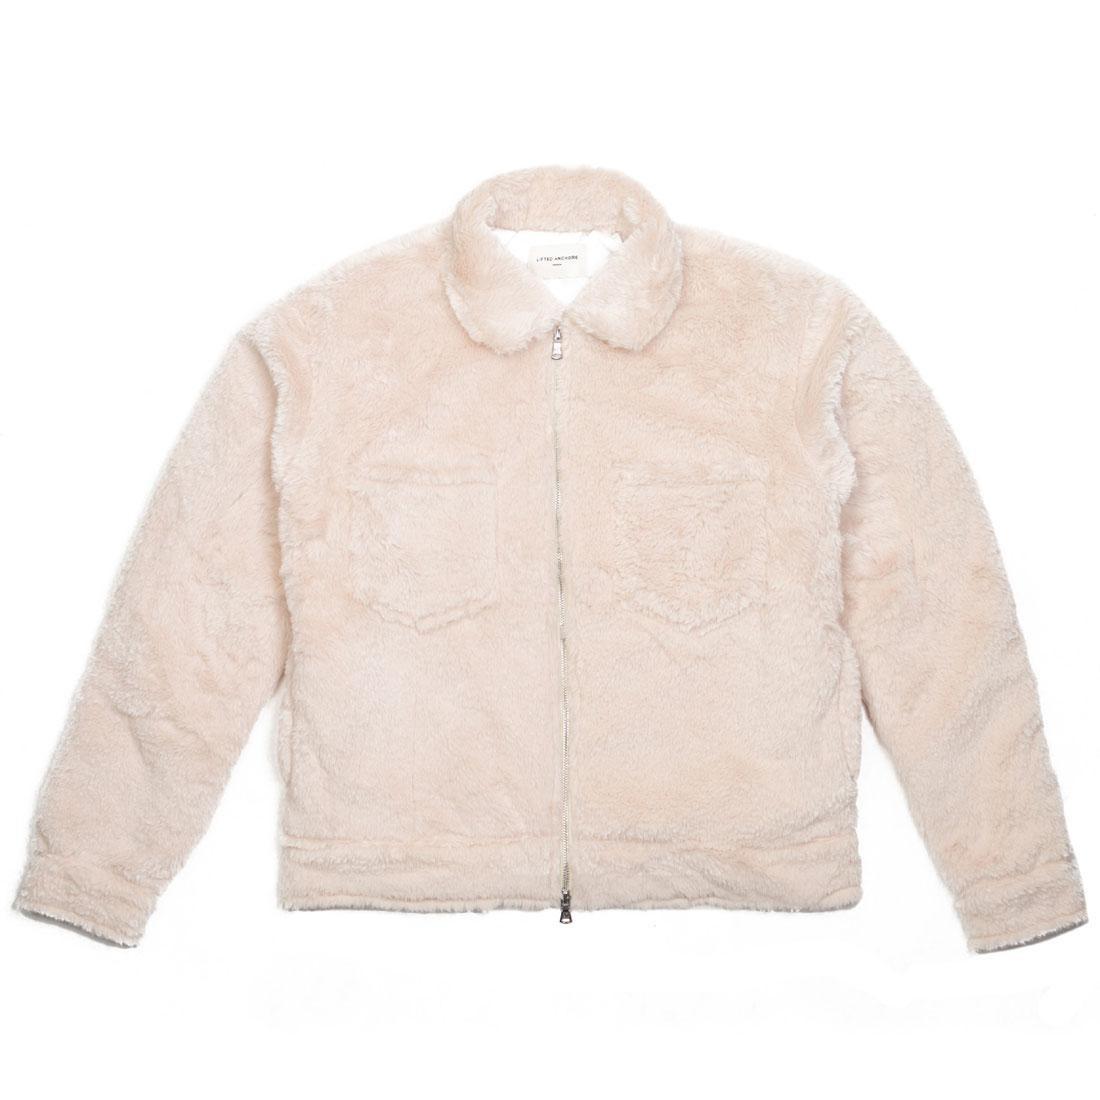 Lifted Anchors Men Fowe Jacket (white / tan)